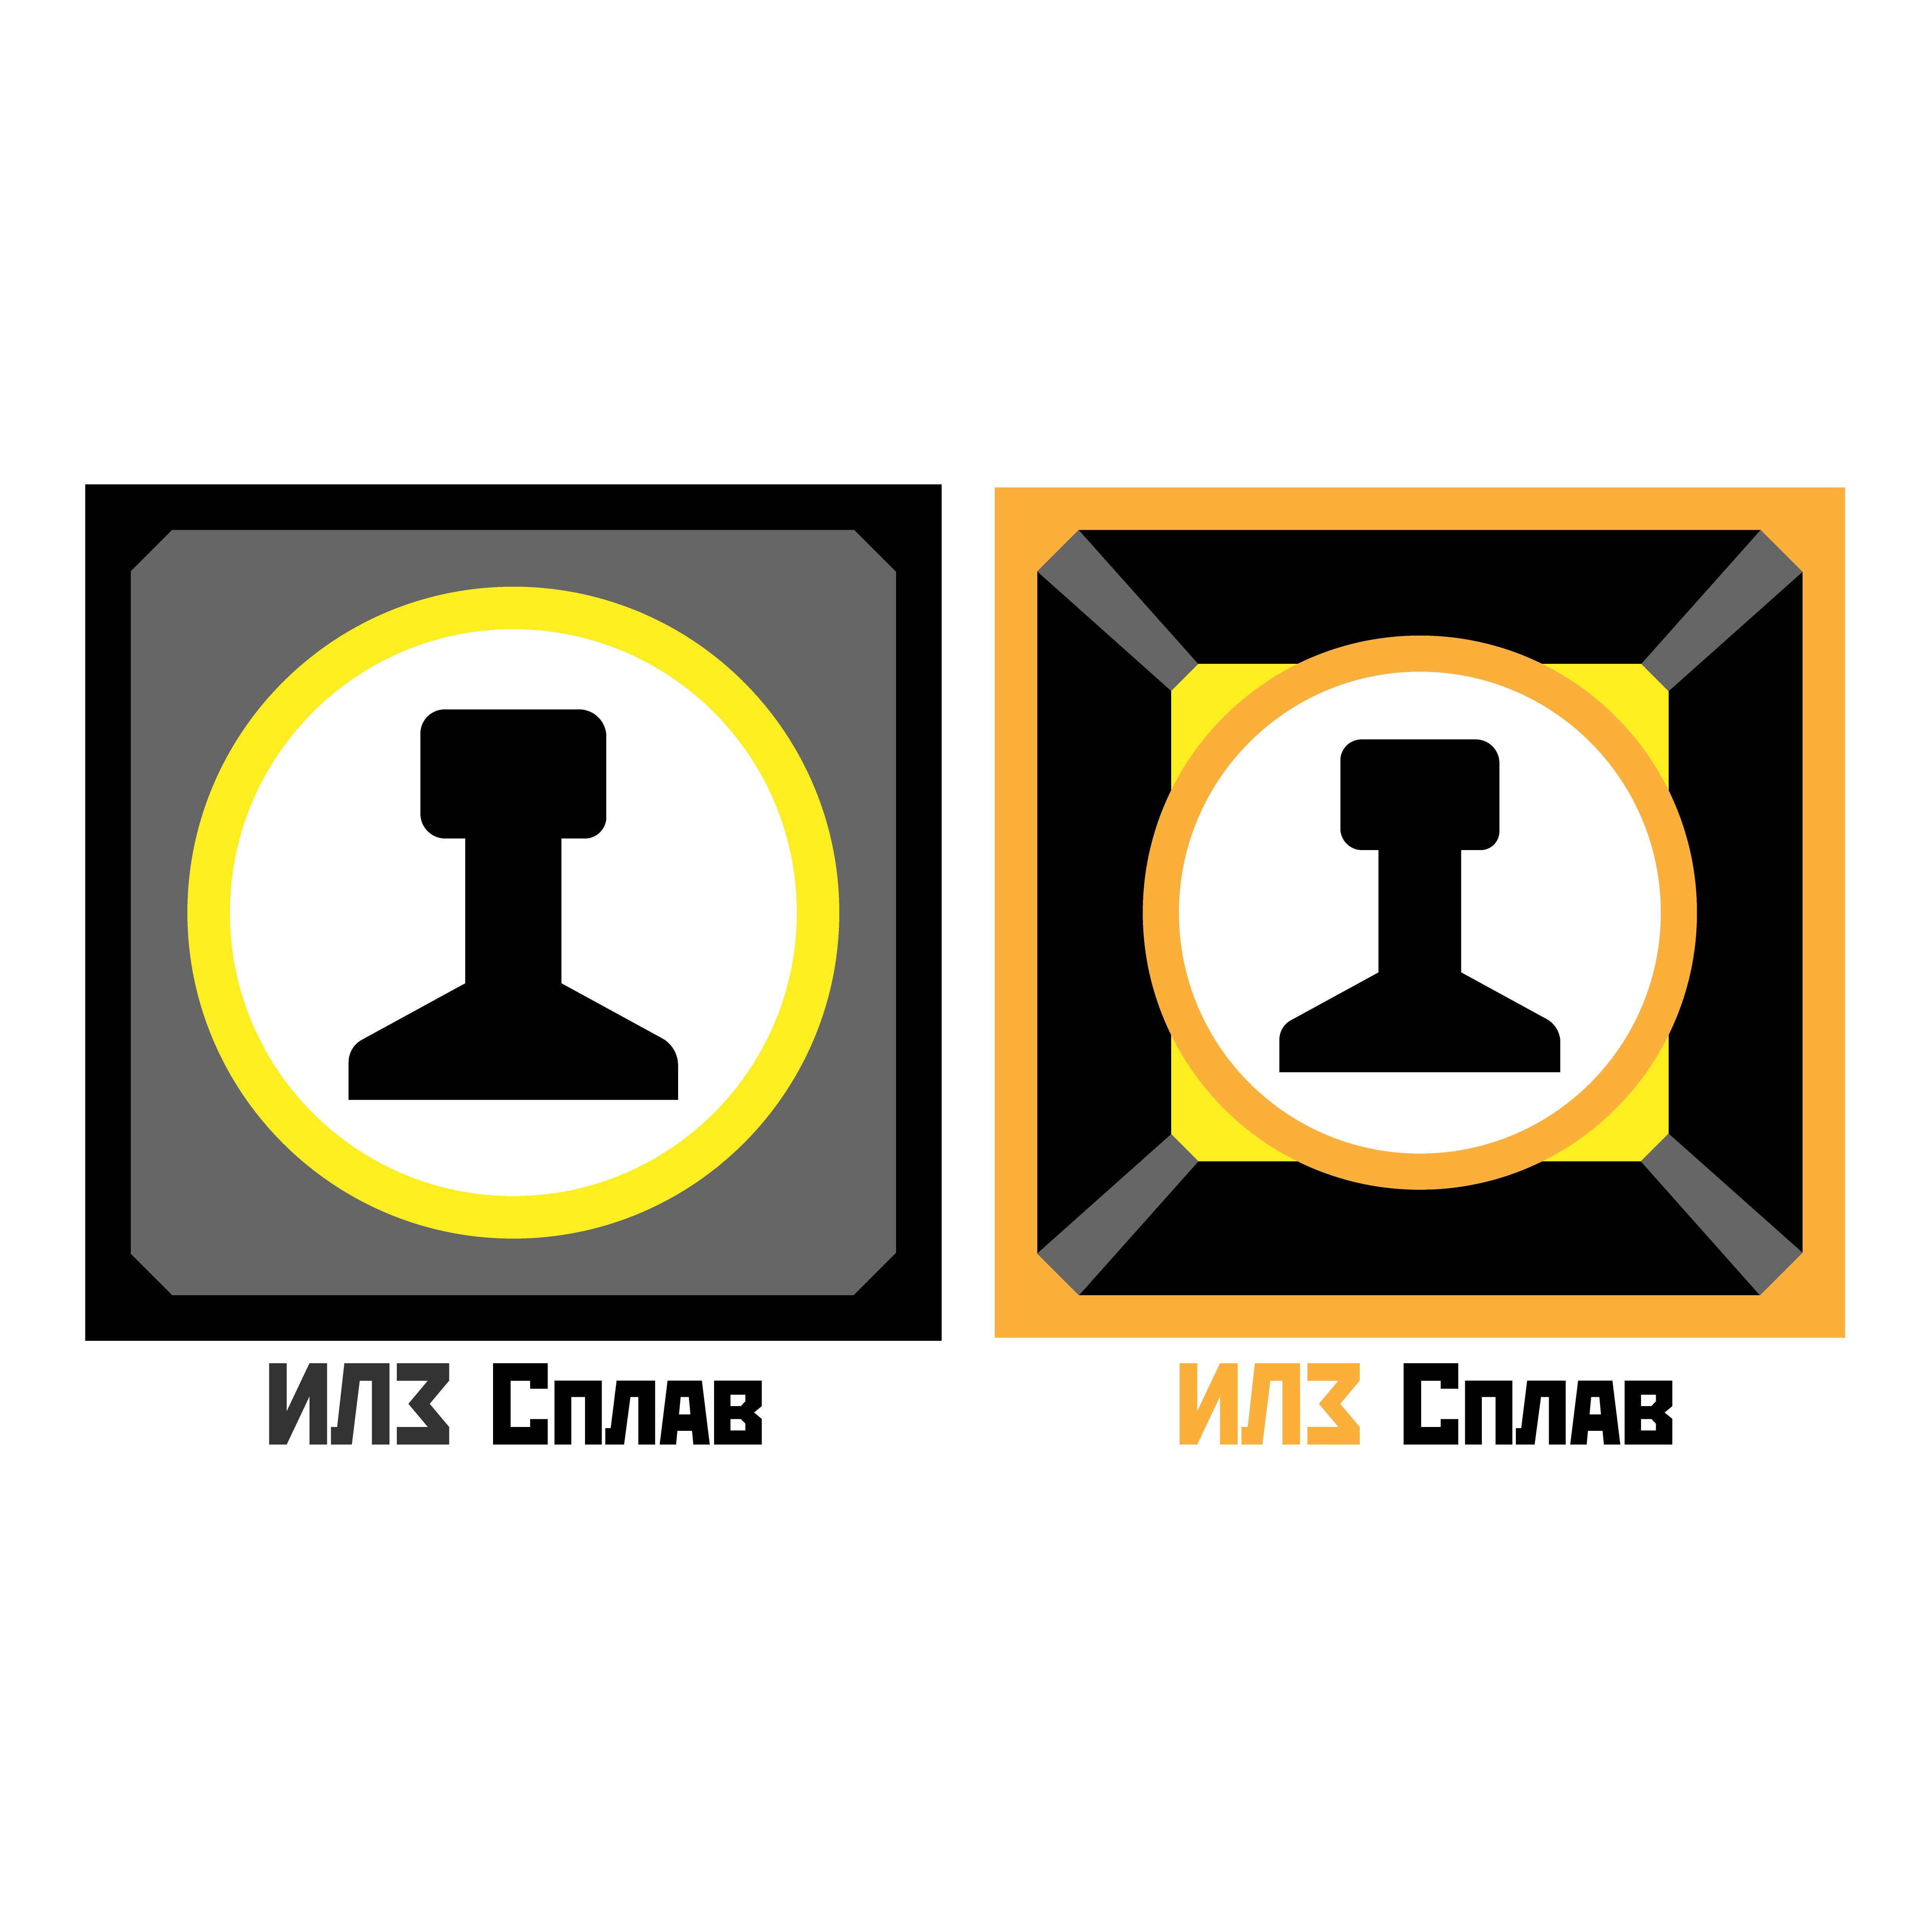 Разработать логотип для литейного завода фото f_9835b02c49a4c820.jpg